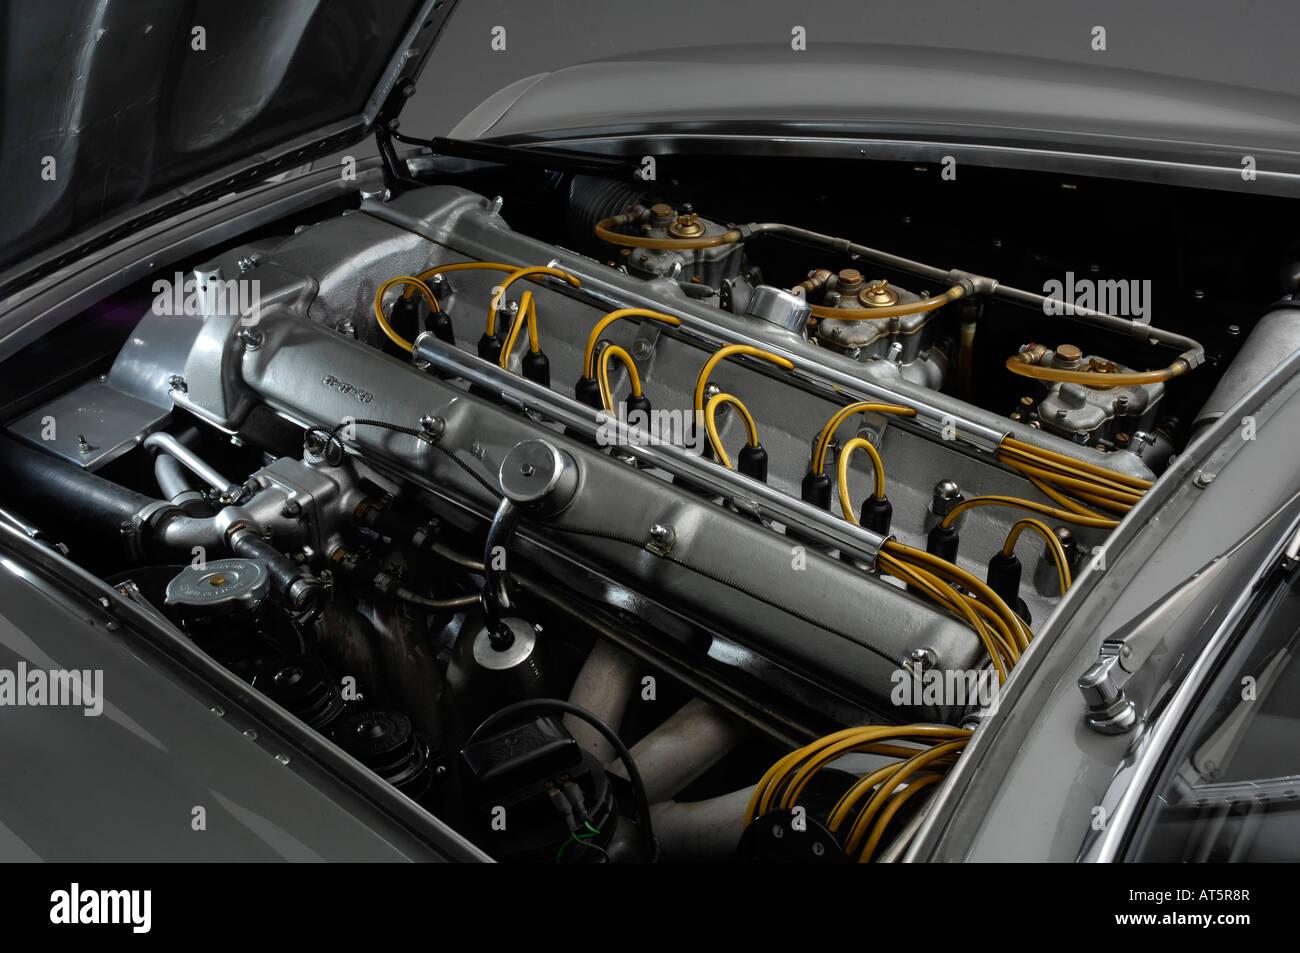 All Types aston db4 zagato : 1961 Aston Martin DB4 GT Zagato engine Stock Photo, Royalty Free ...